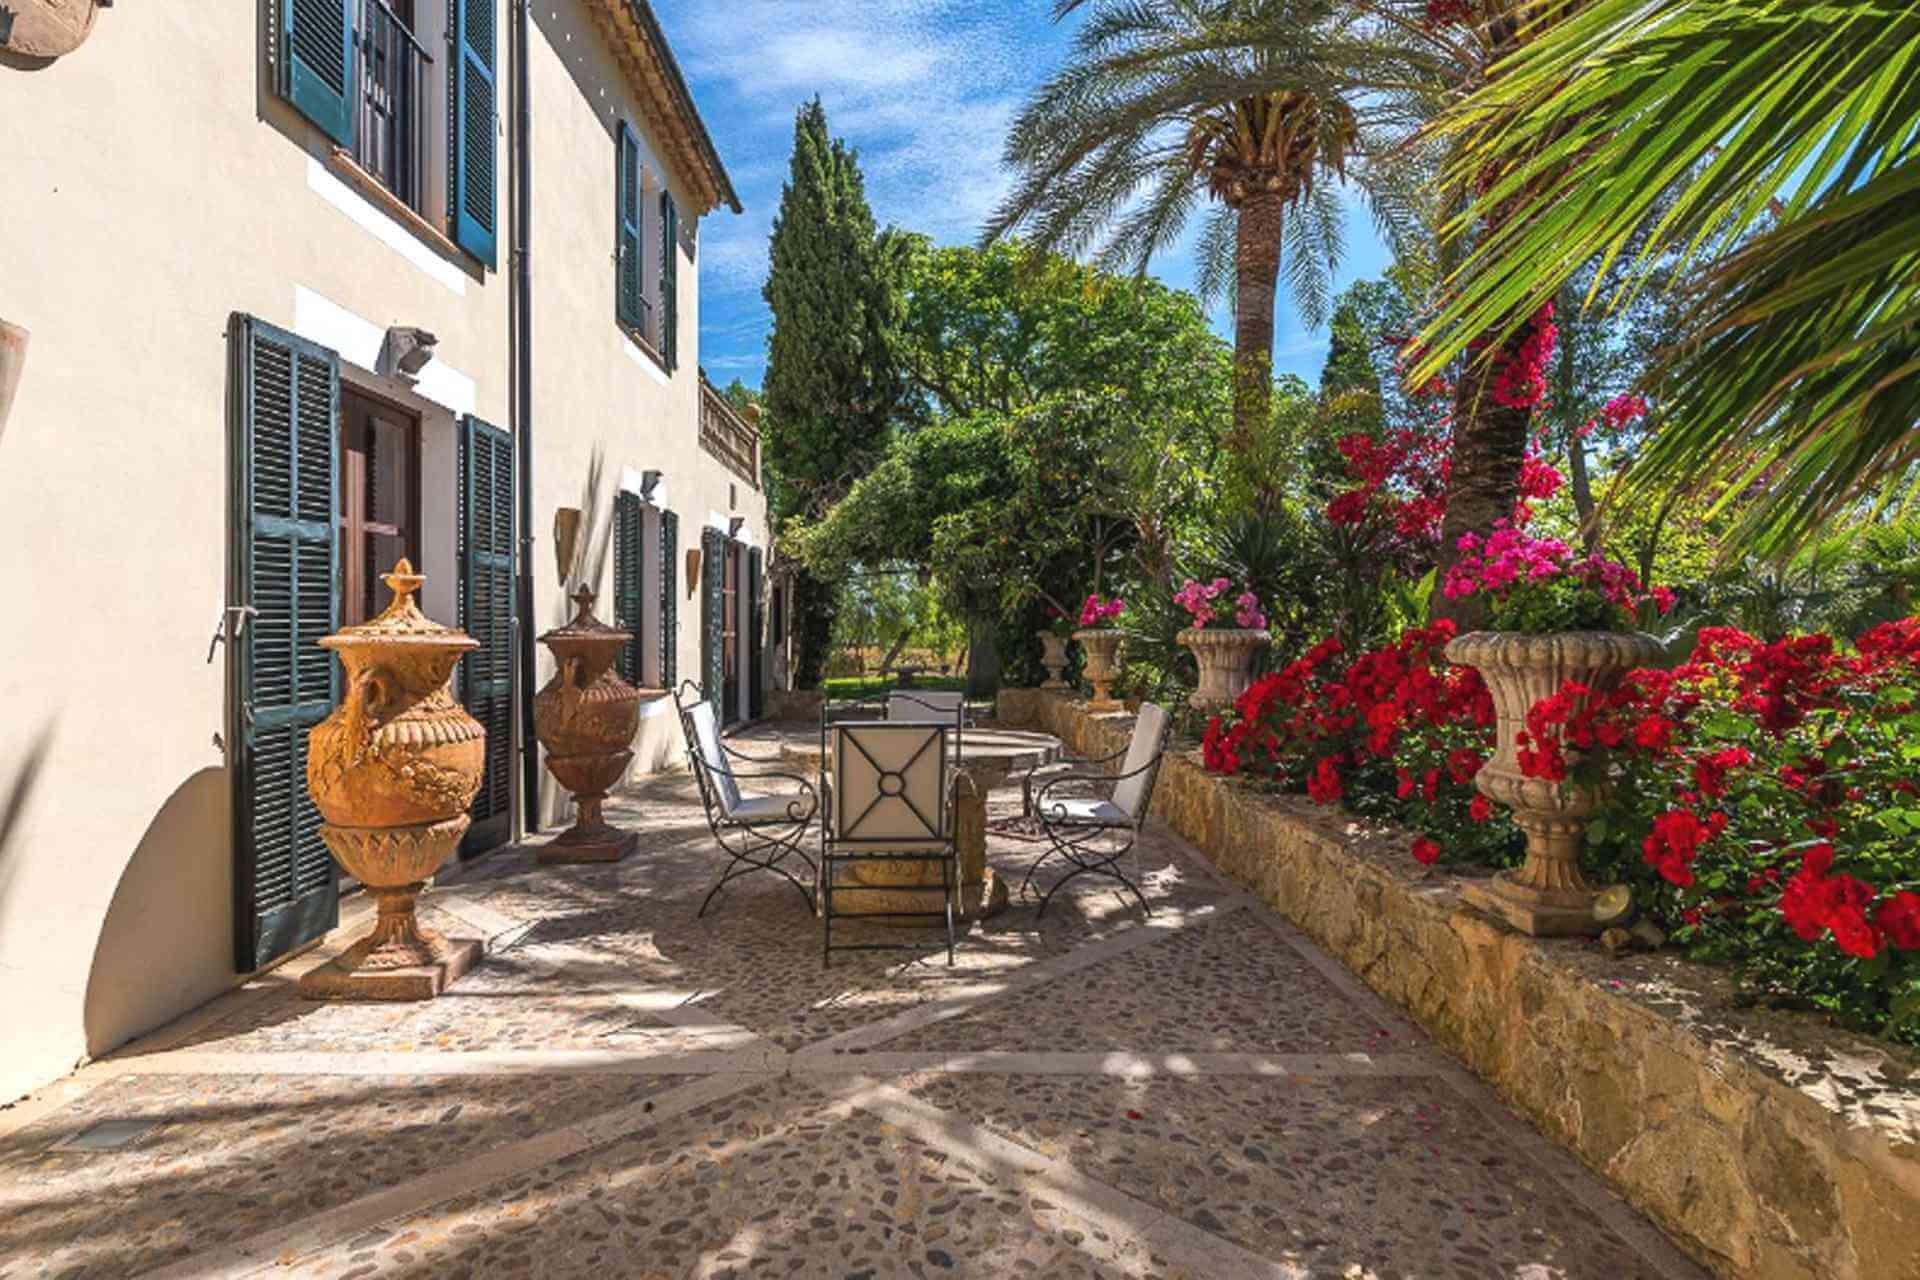 01-87 Luxuriöse Finca Mallorca Zentrum Bild 3